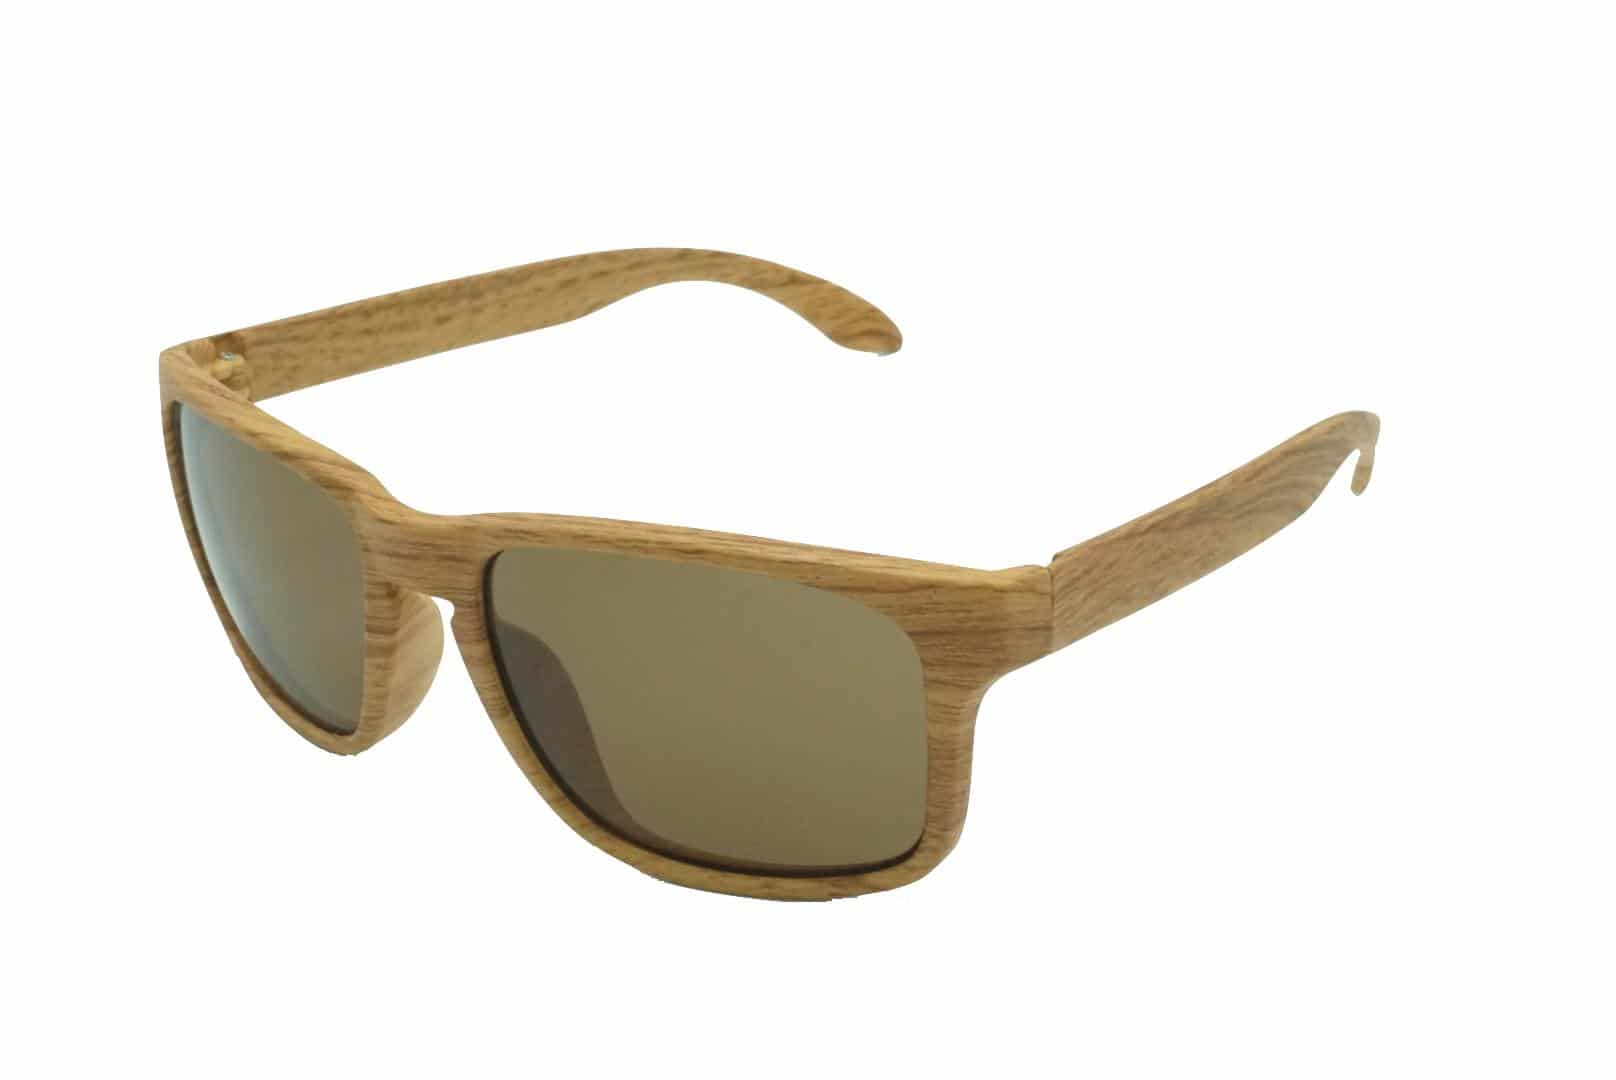 4Goodz Ibiza brown - houtlook wayfarer zonnebril - Bruin - Uv400